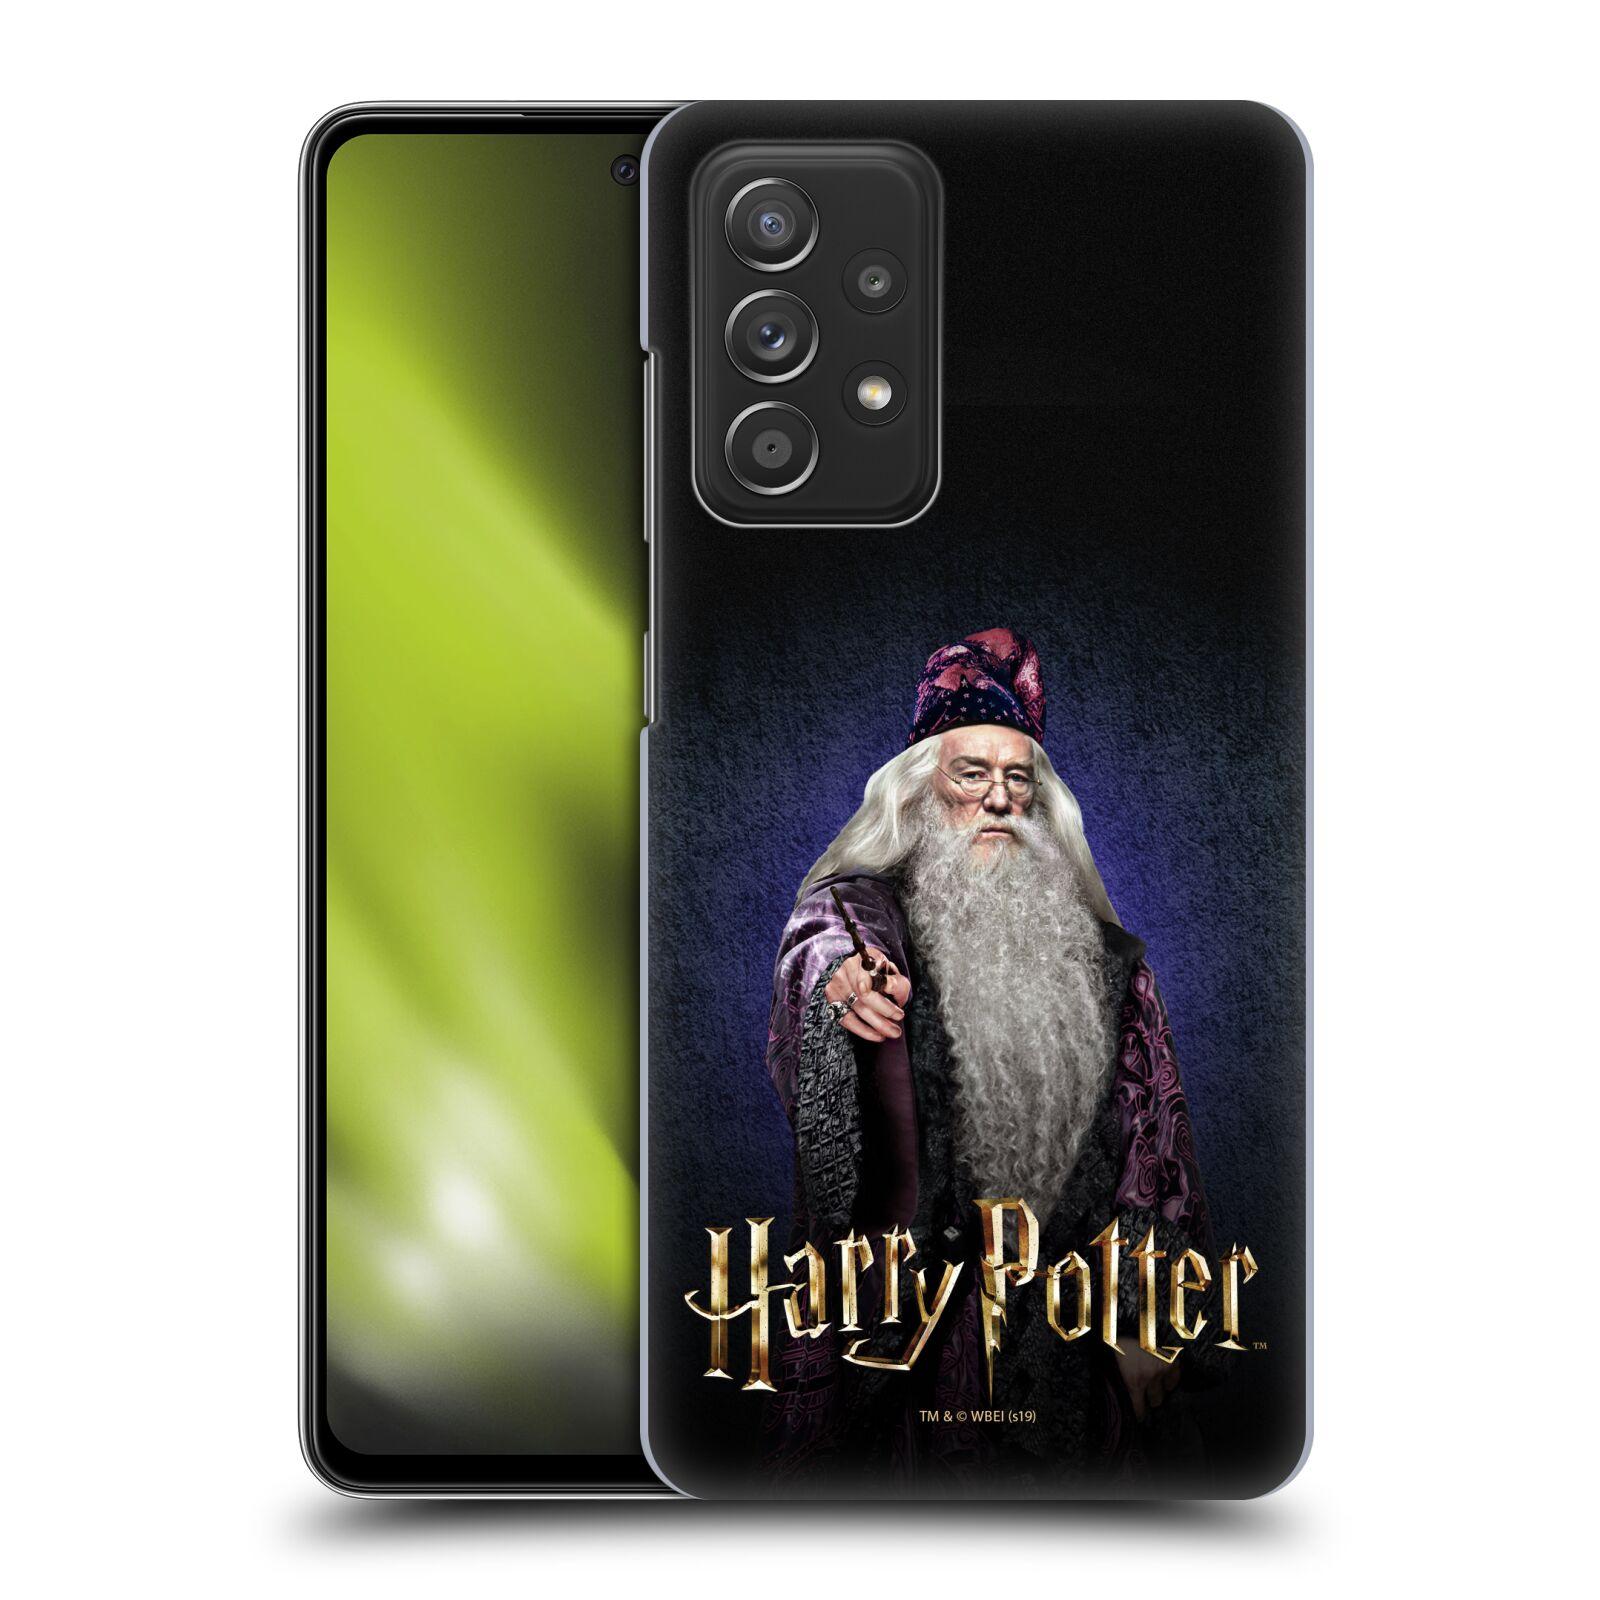 Plastové pouzdro na mobil Samsung Galaxy A52 / A52 5G / A52s 5G - Harry Potter - Albus Brumbál